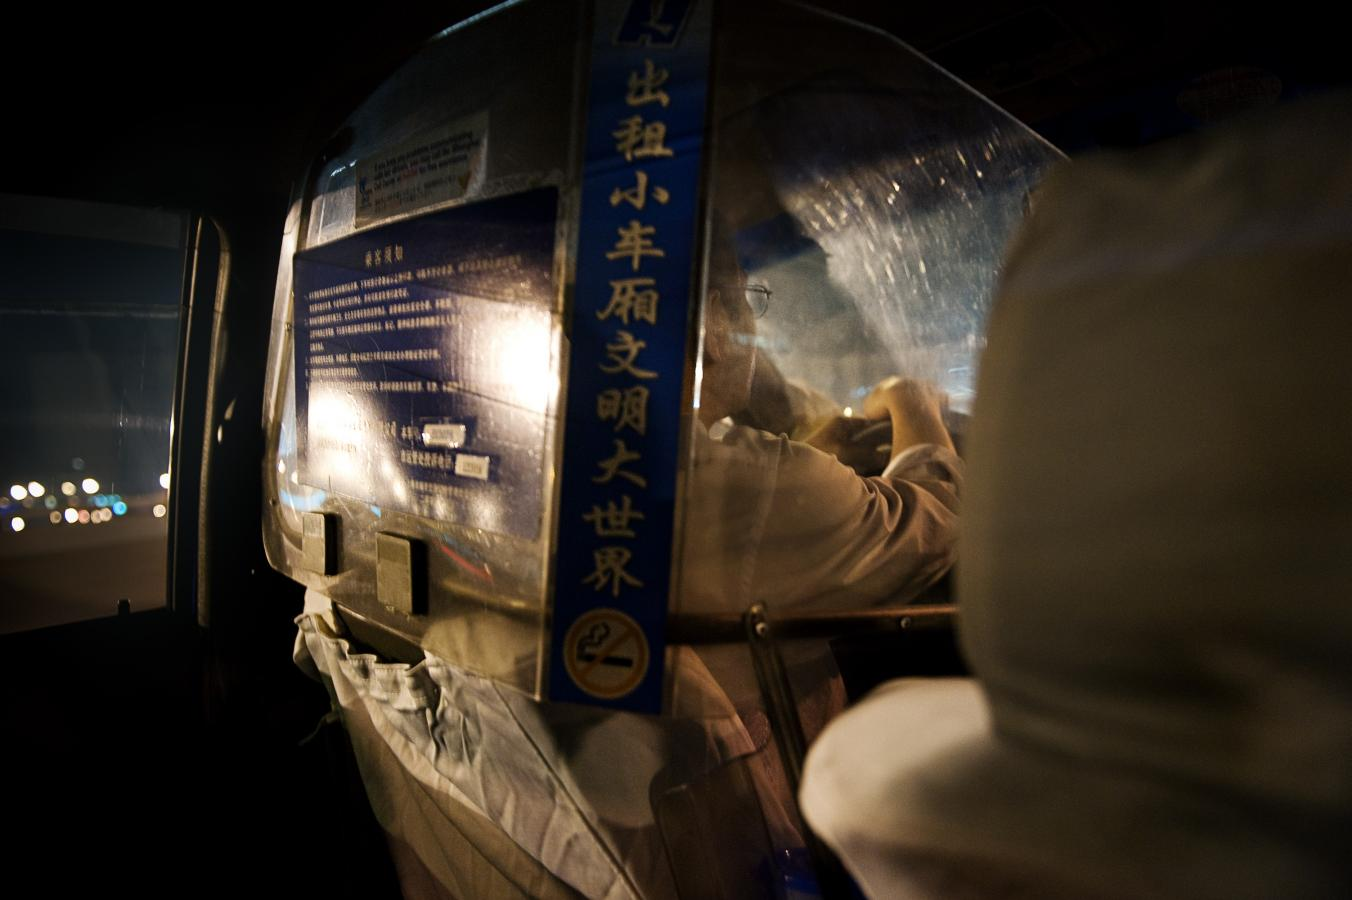 mister-cab-driver-shanghai-2010